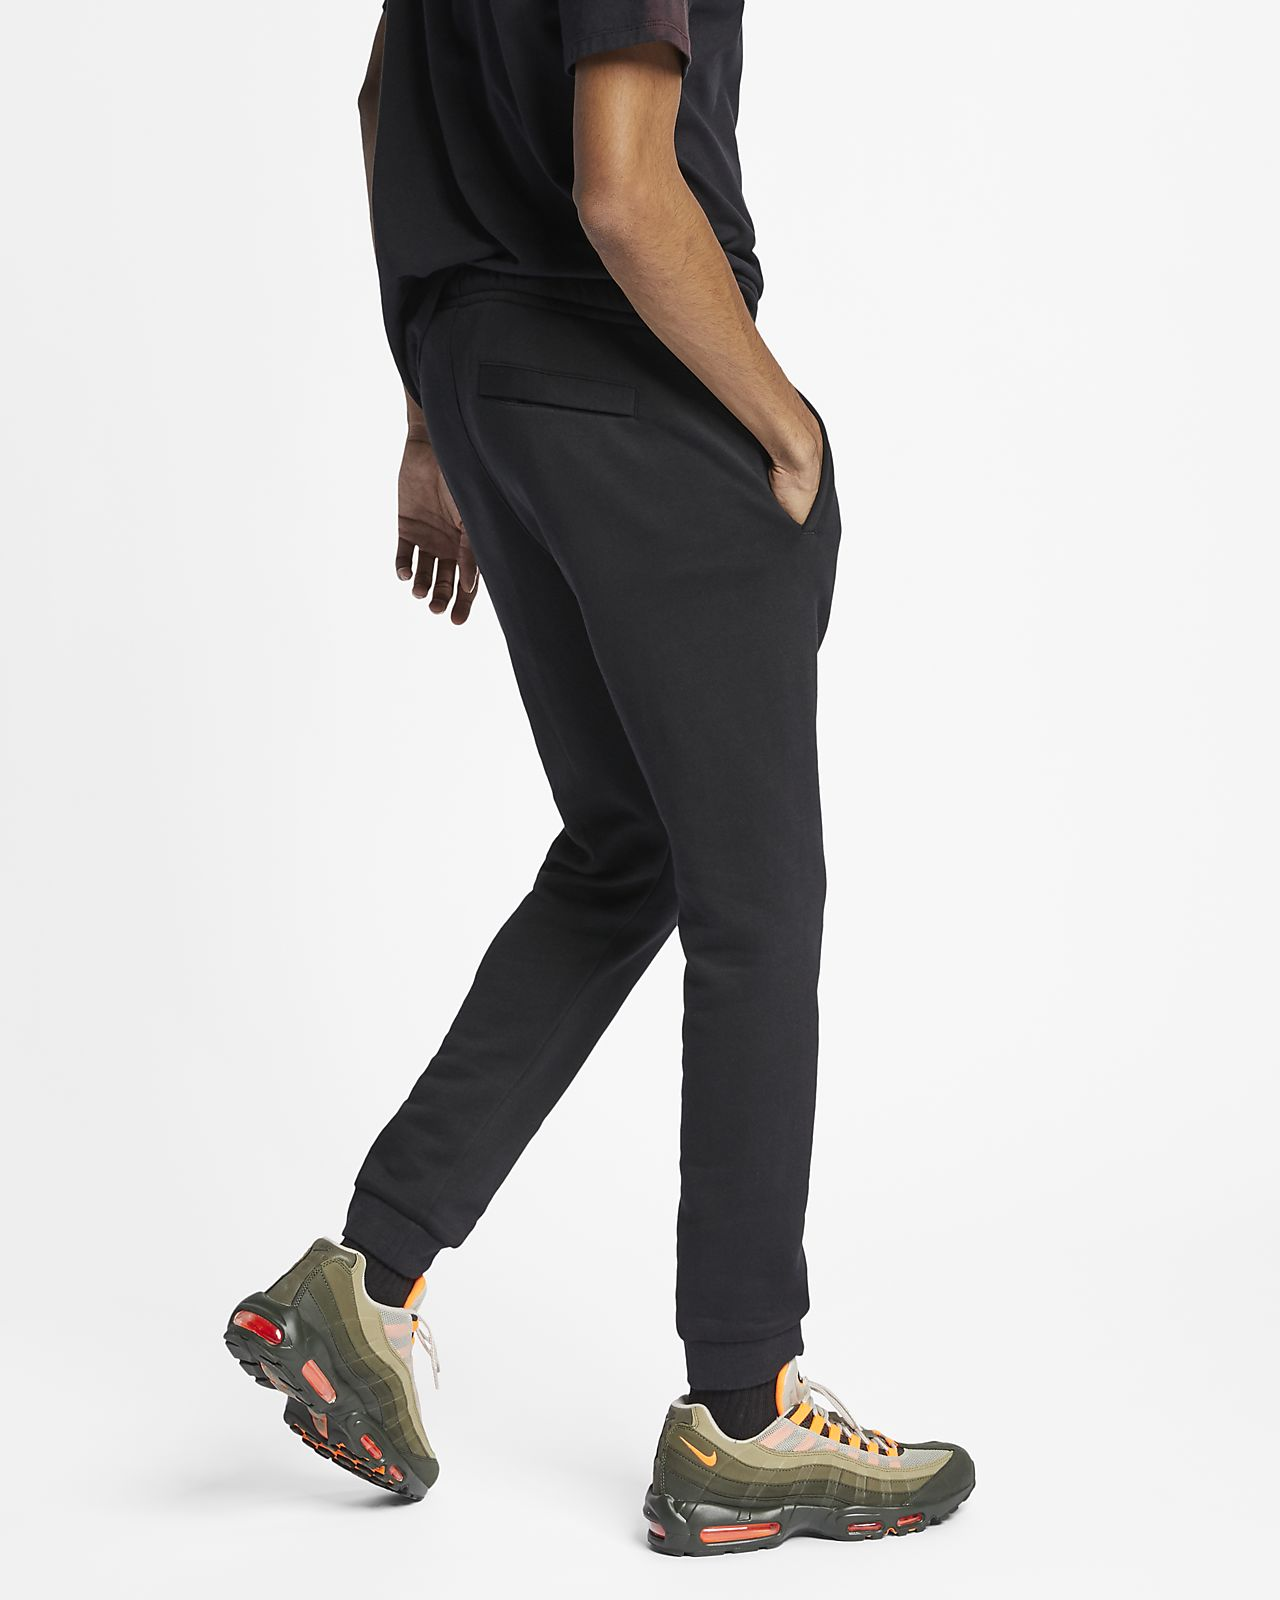 5fbf4d15a46c3 ... Pantalones de entrenamiento de vellón para hombre Nike Sportswear JDI